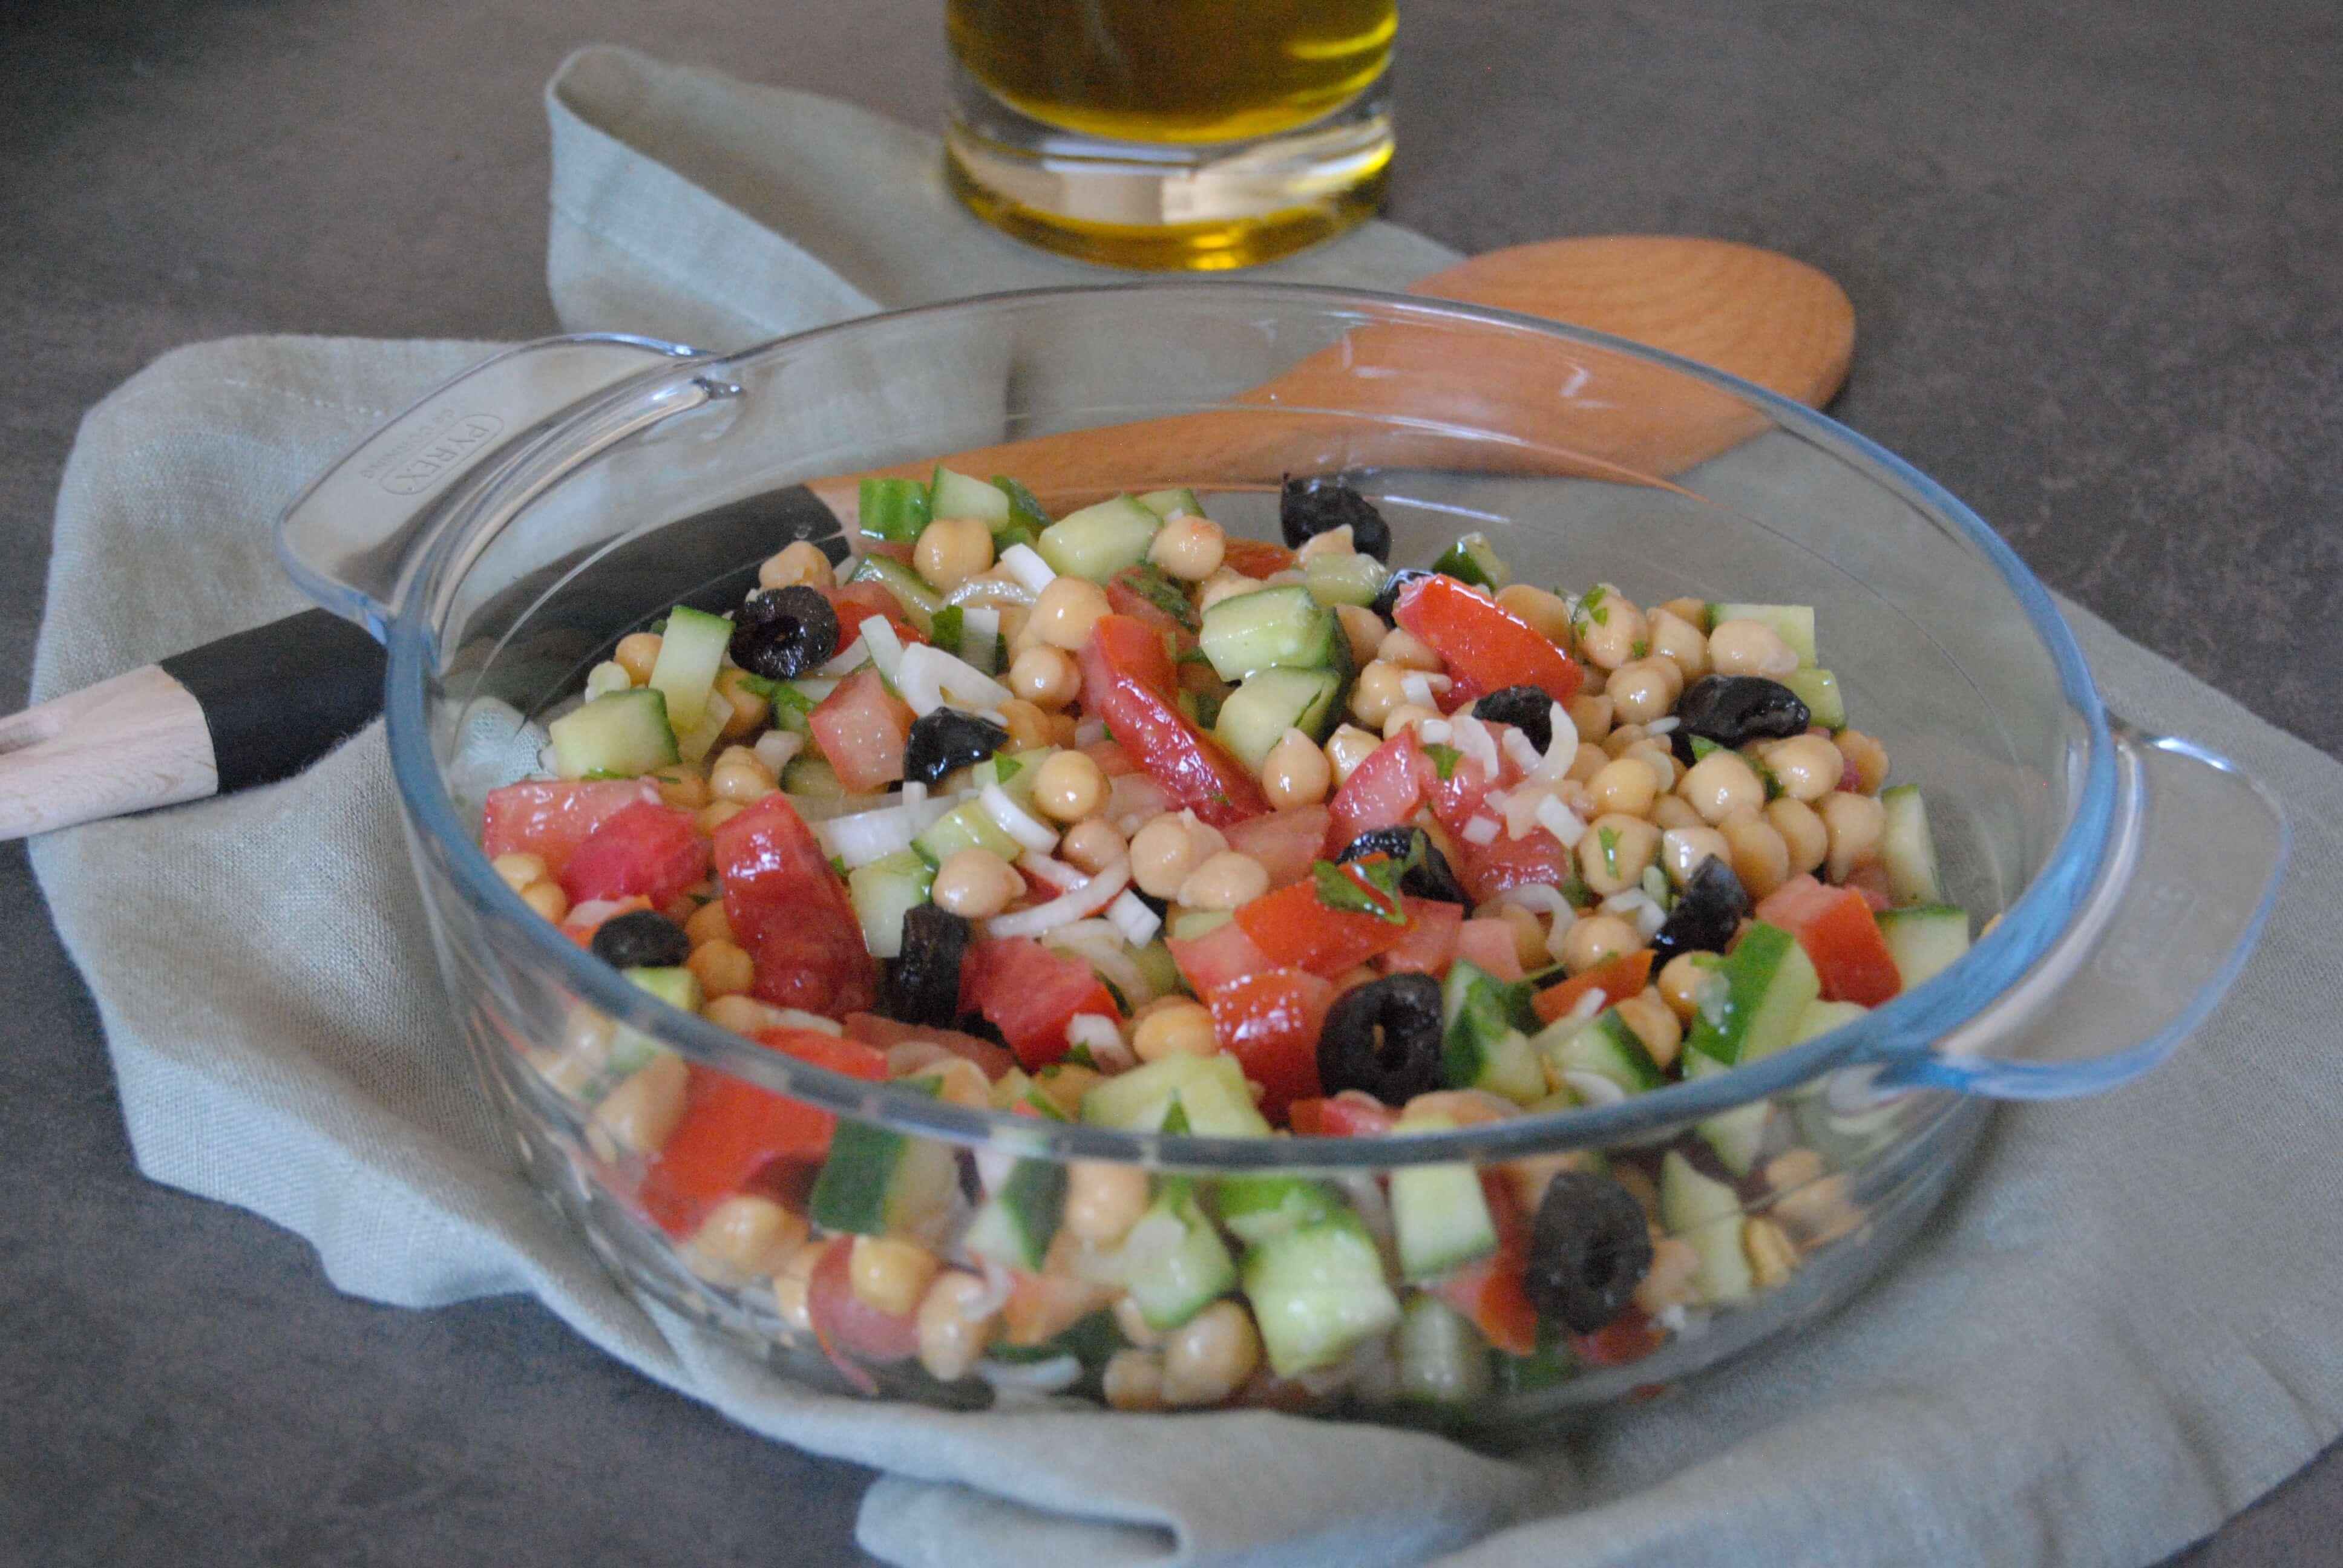 salade-pois-chiches-concombre-et-tomate